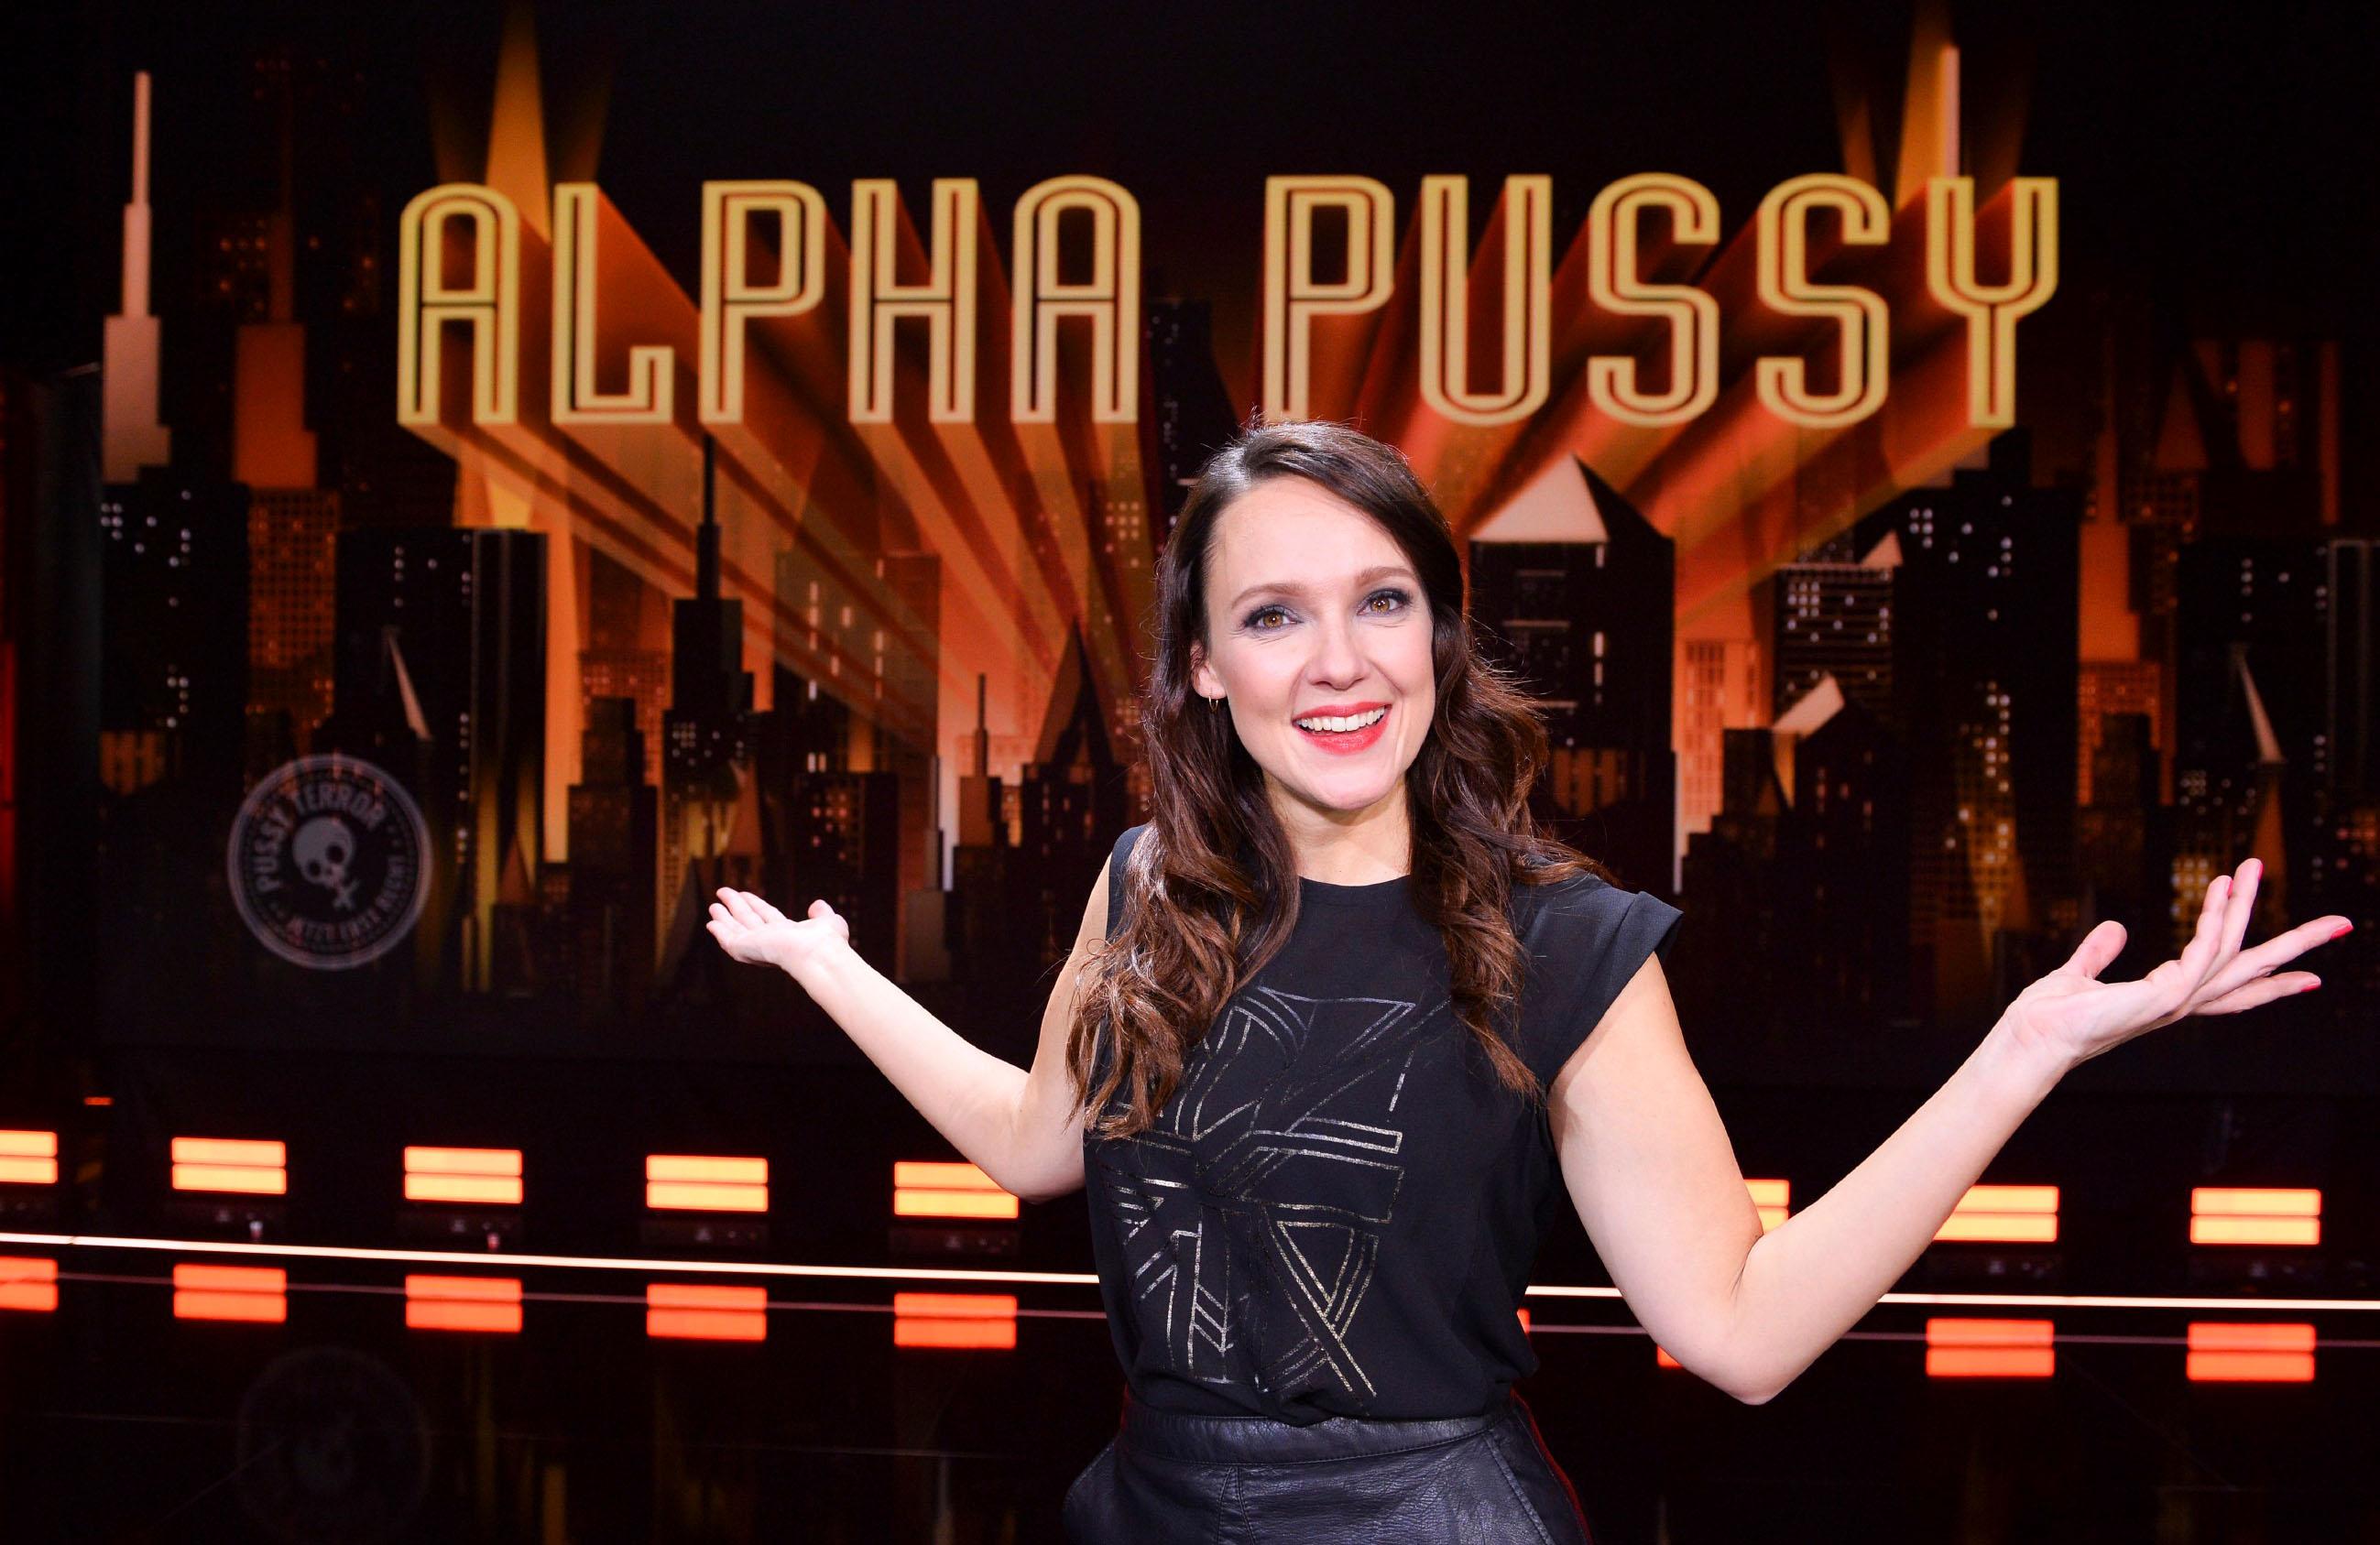 Carolin Kebekus Alpha Pussy